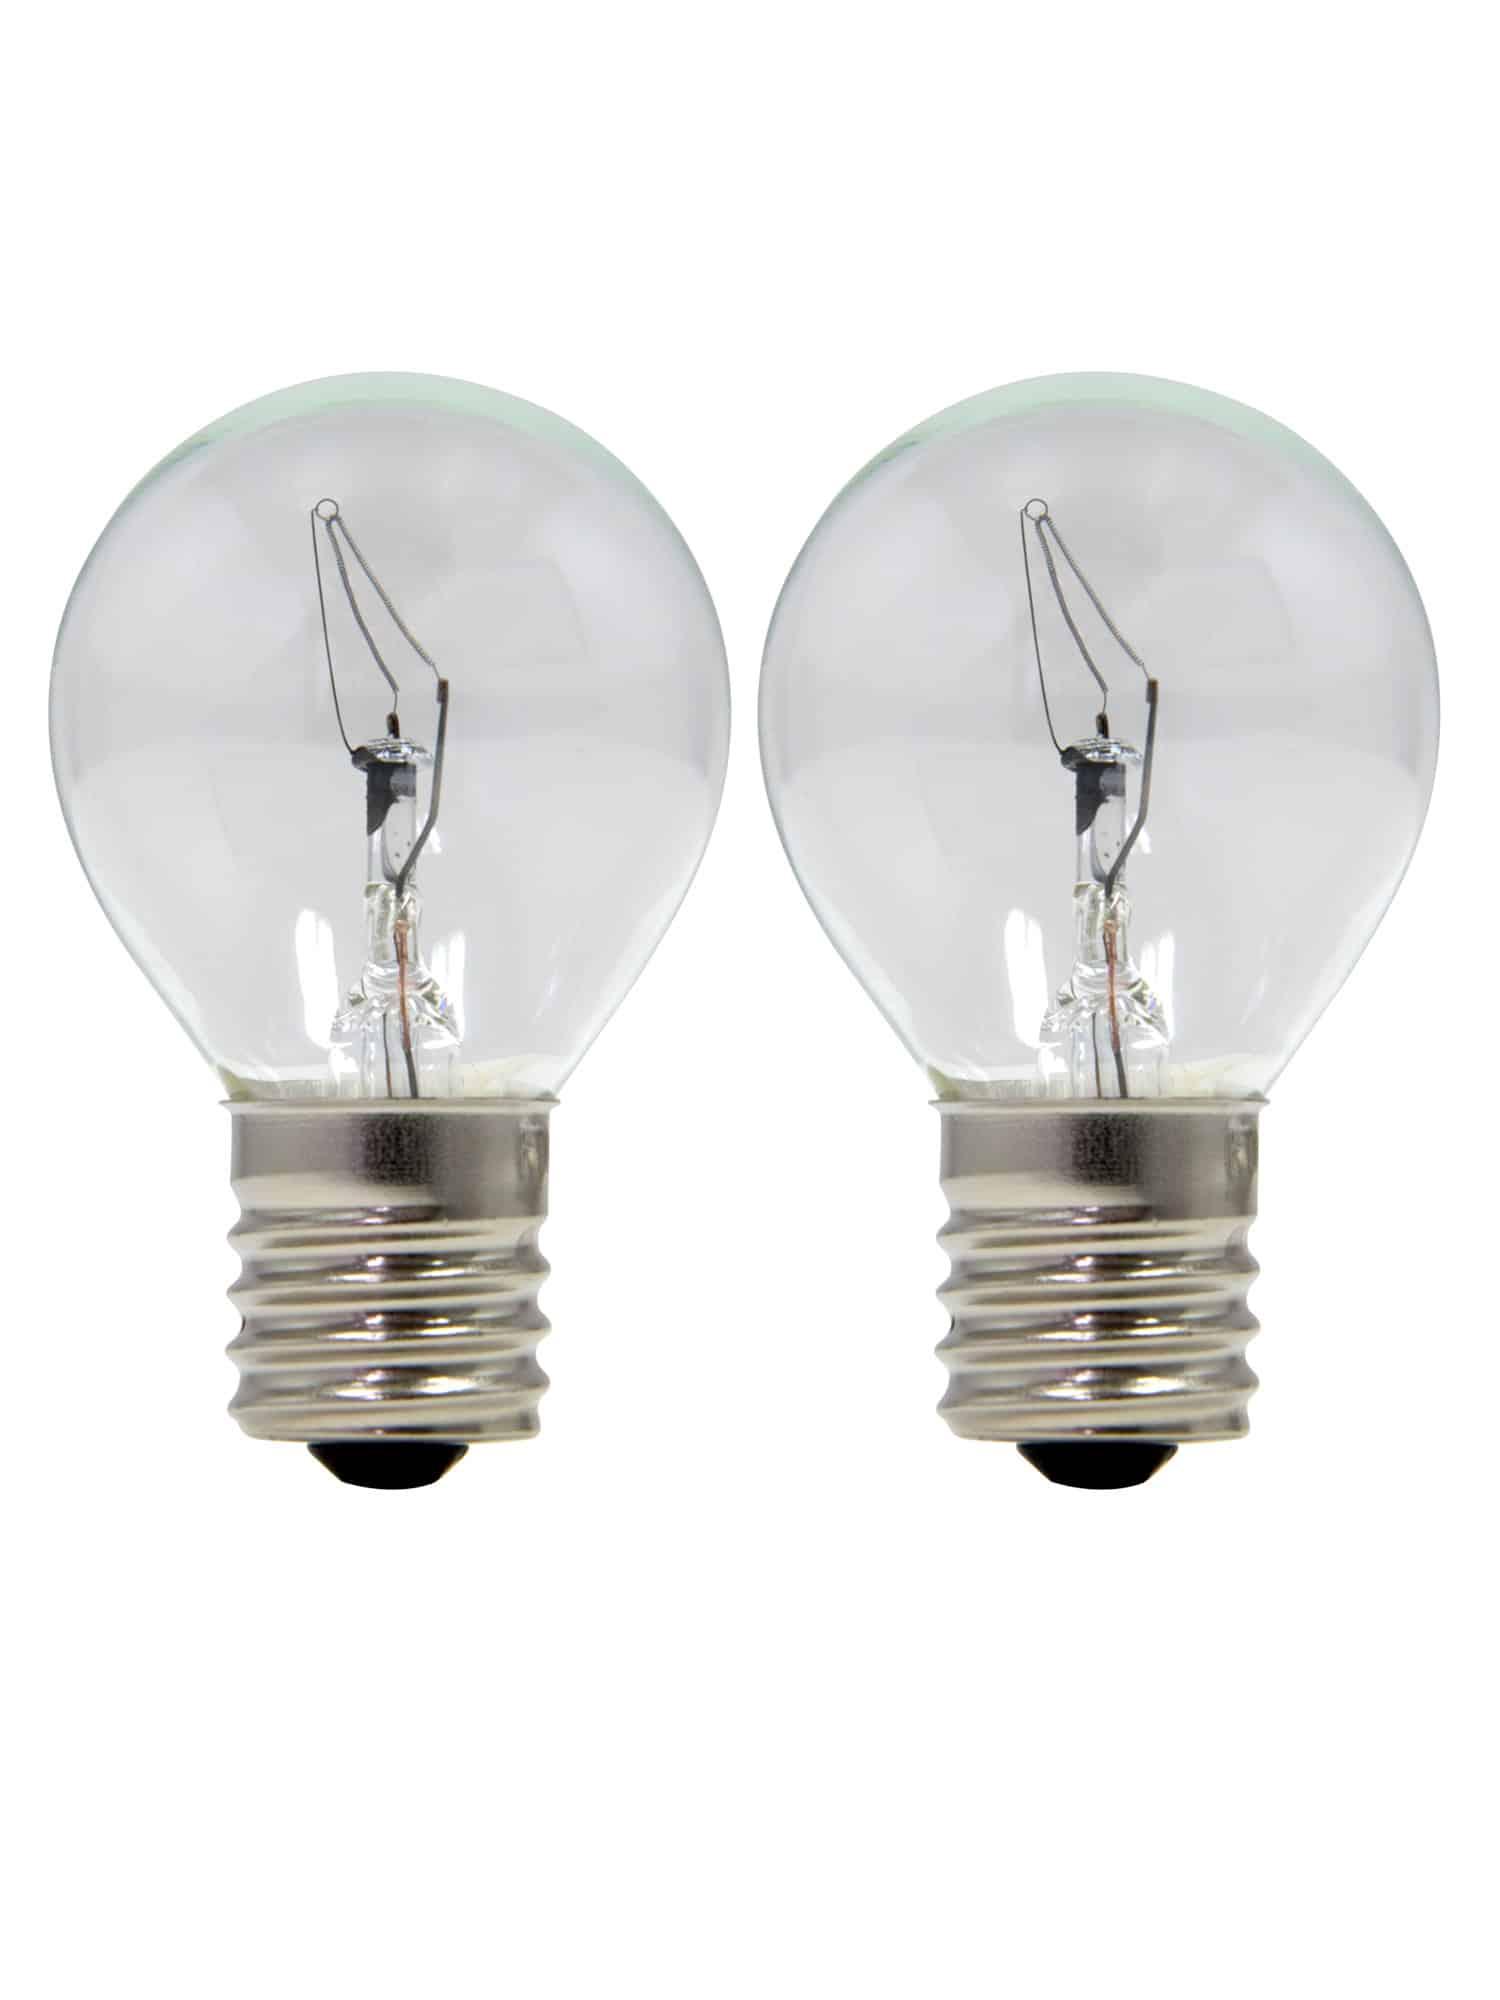 Lava lamp light bulbs parts accessories lava lamp 5025 aloadofball Gallery